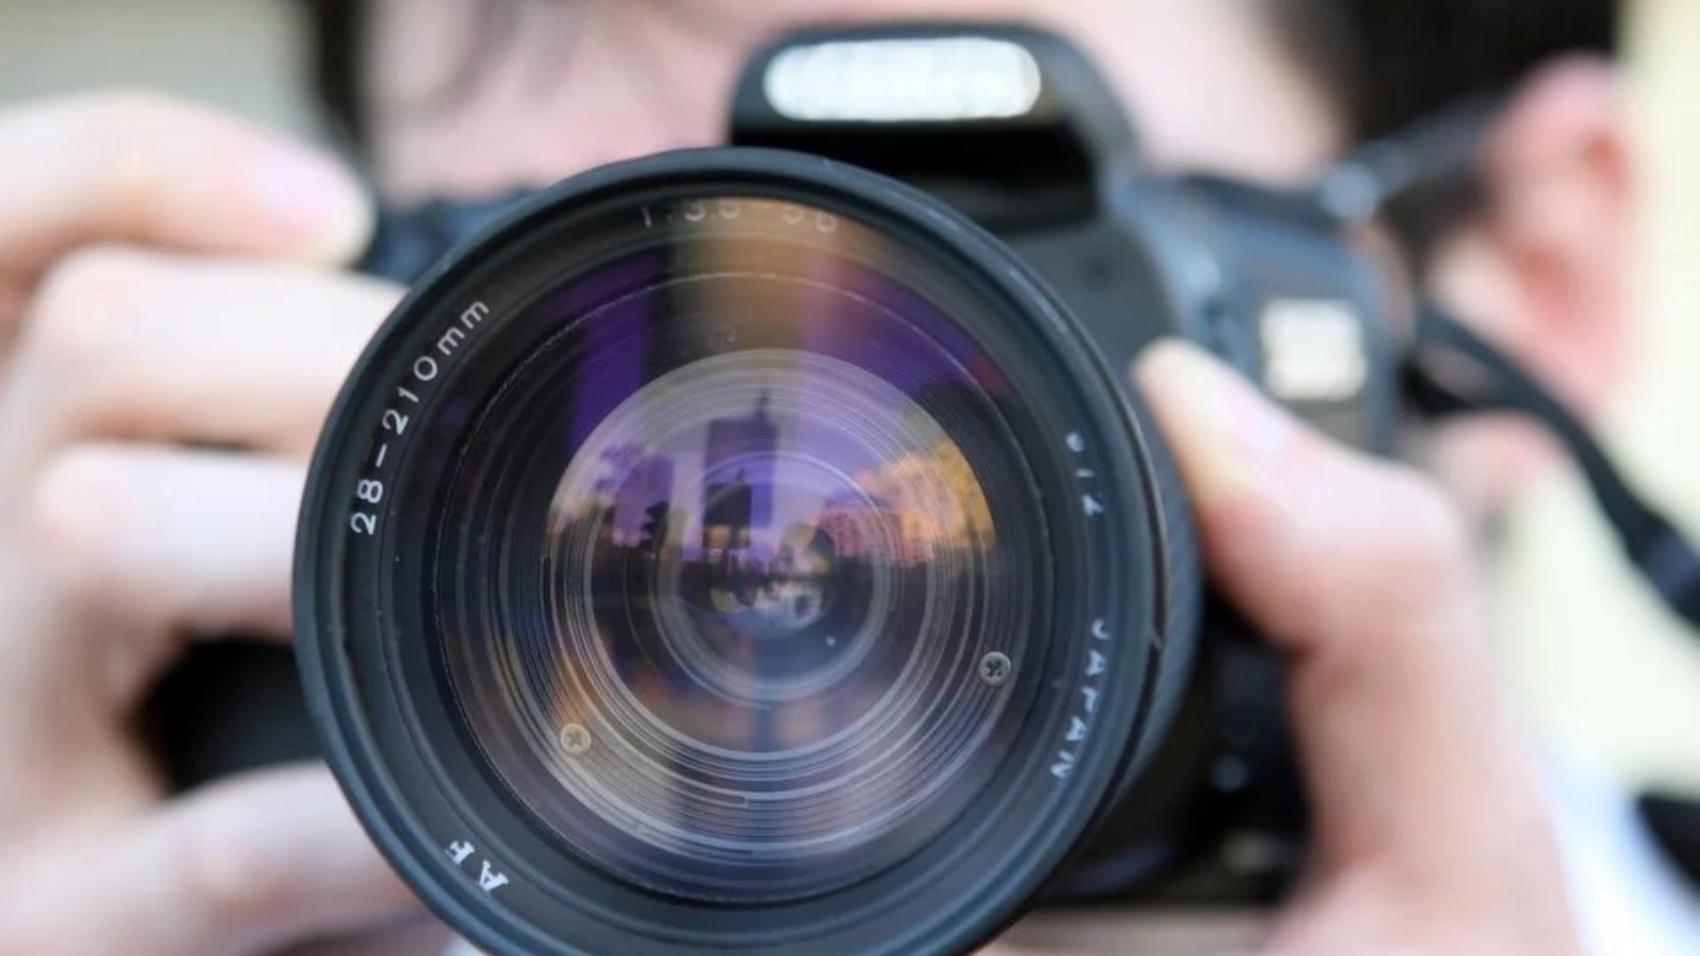 camera-1239384_960_720